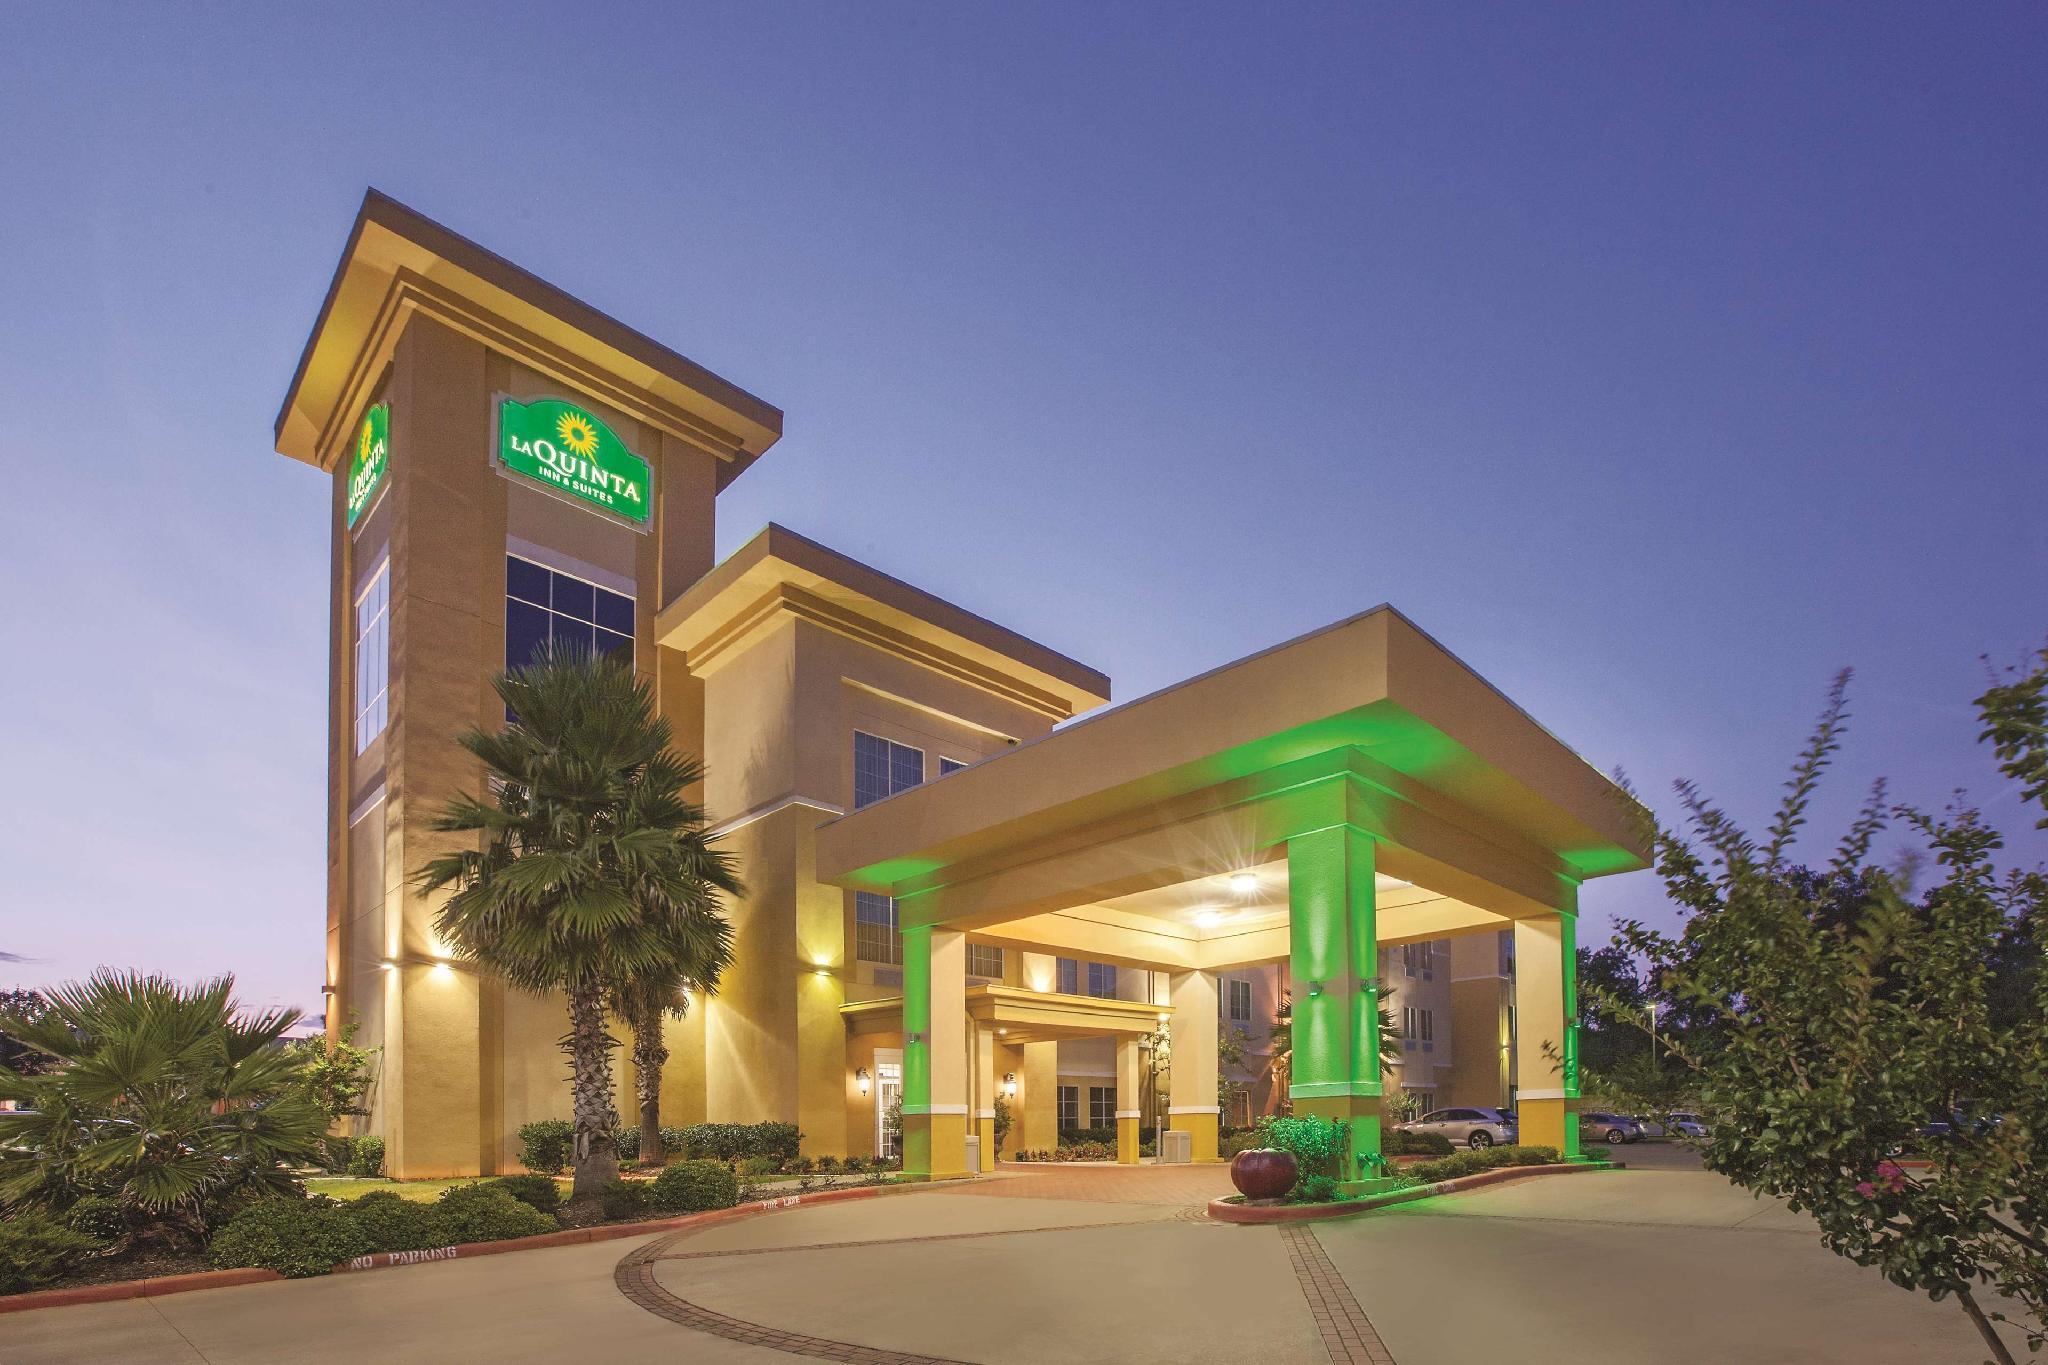 La Quinta Inn And Suites By Wyndham Jacksonville